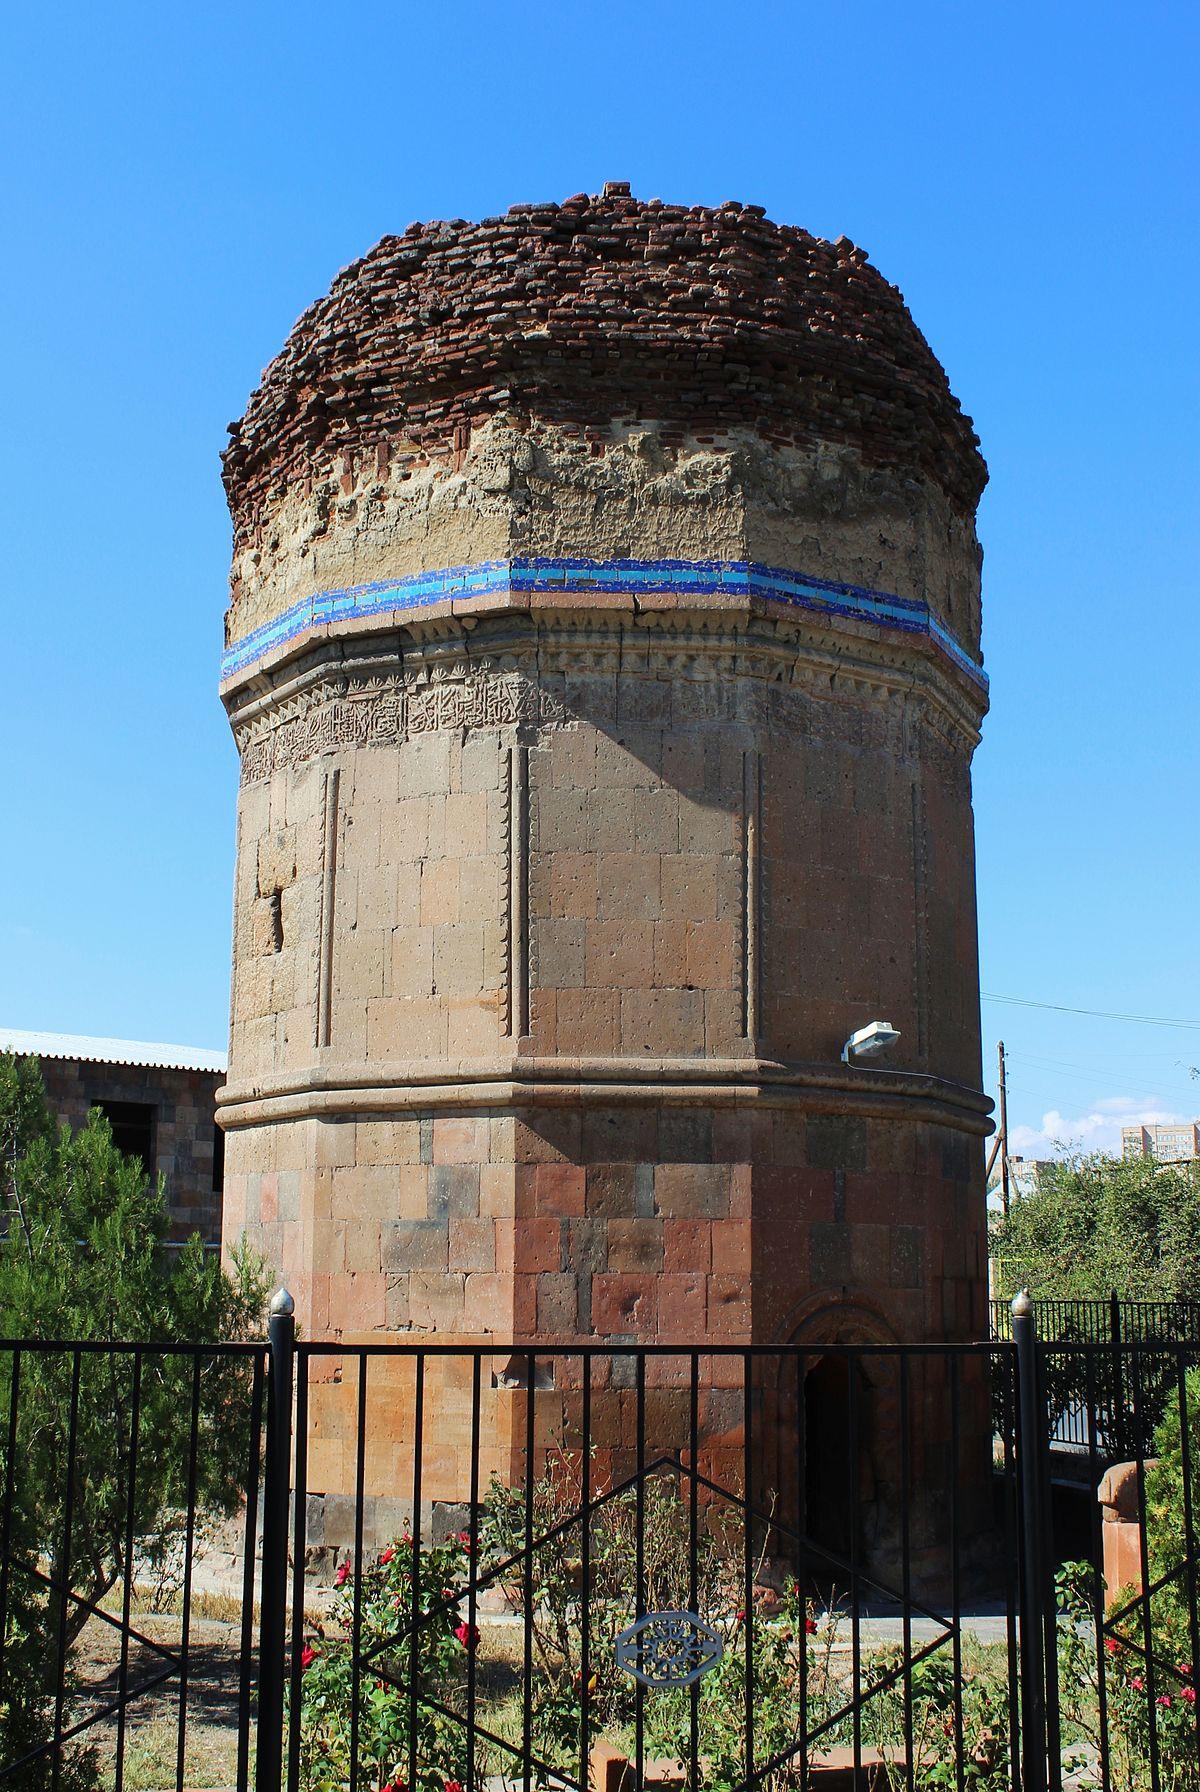 Mausoleum of Kara Koyunlu emirs - Wikipedia